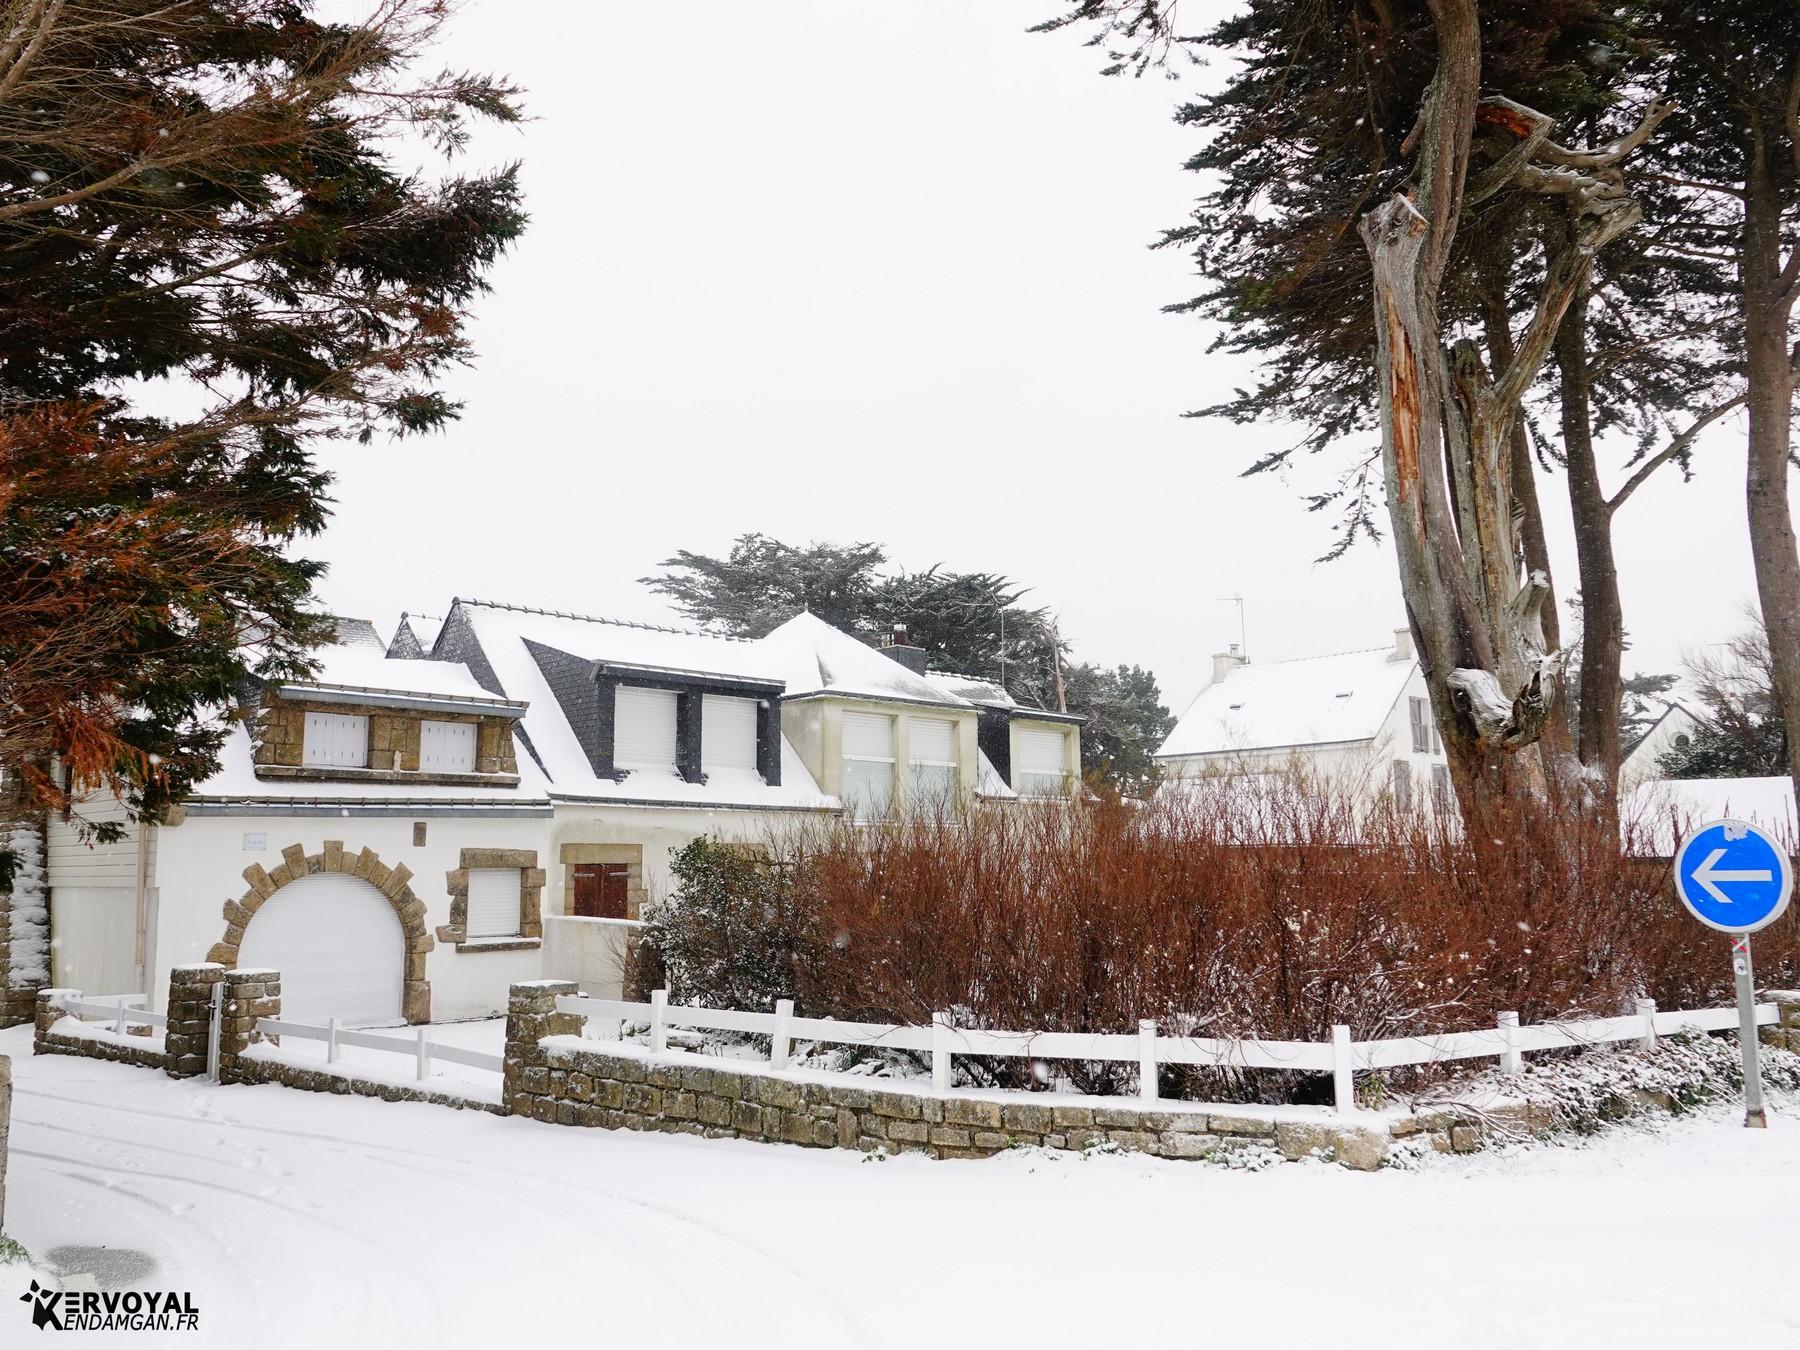 neige à kervoyal 11 février 2021 damgan morbihan (5)